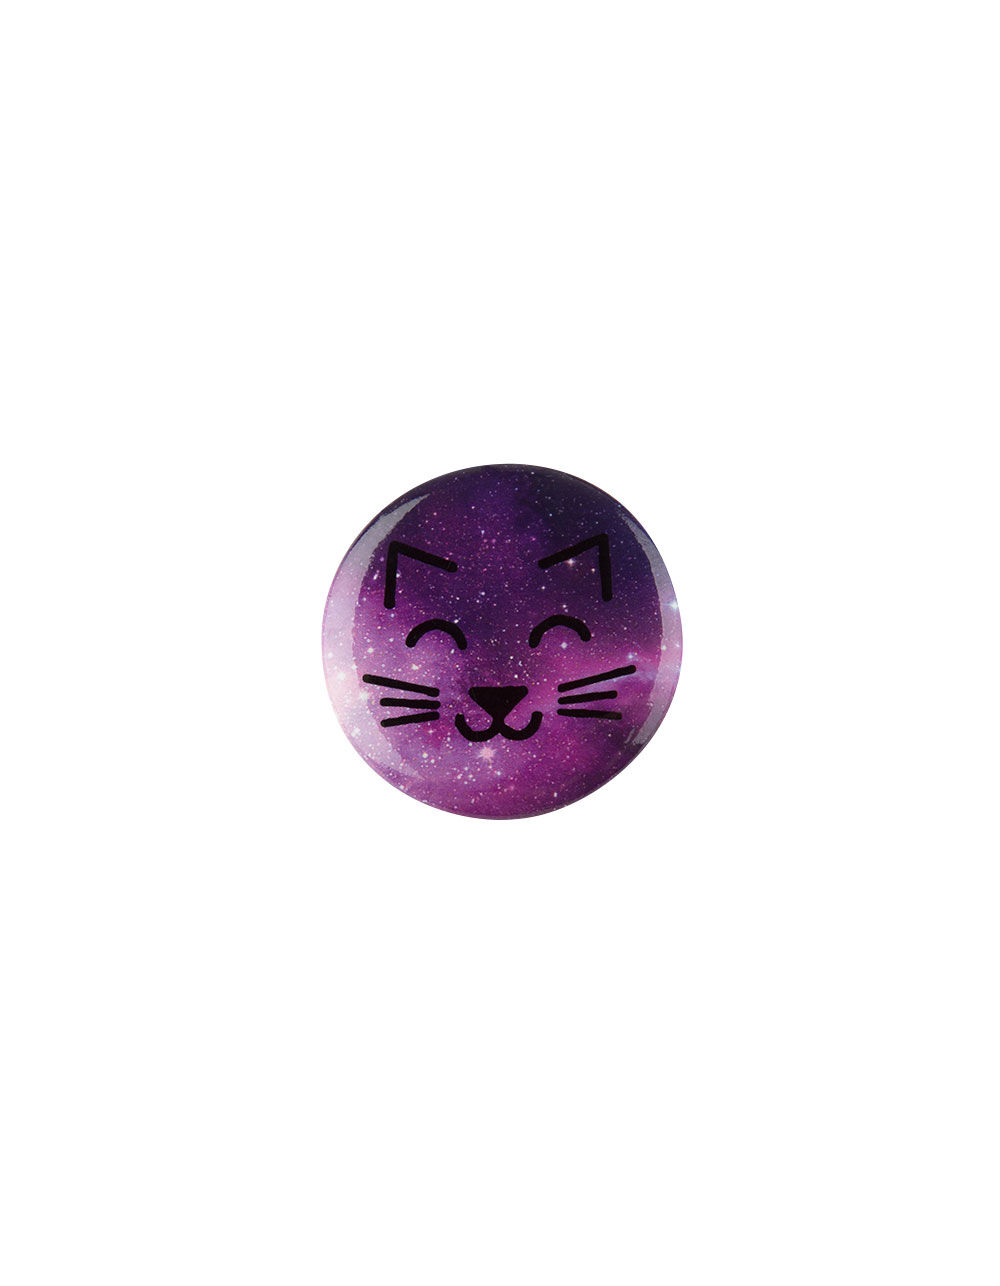 Image of GALAXY KITTY PIN